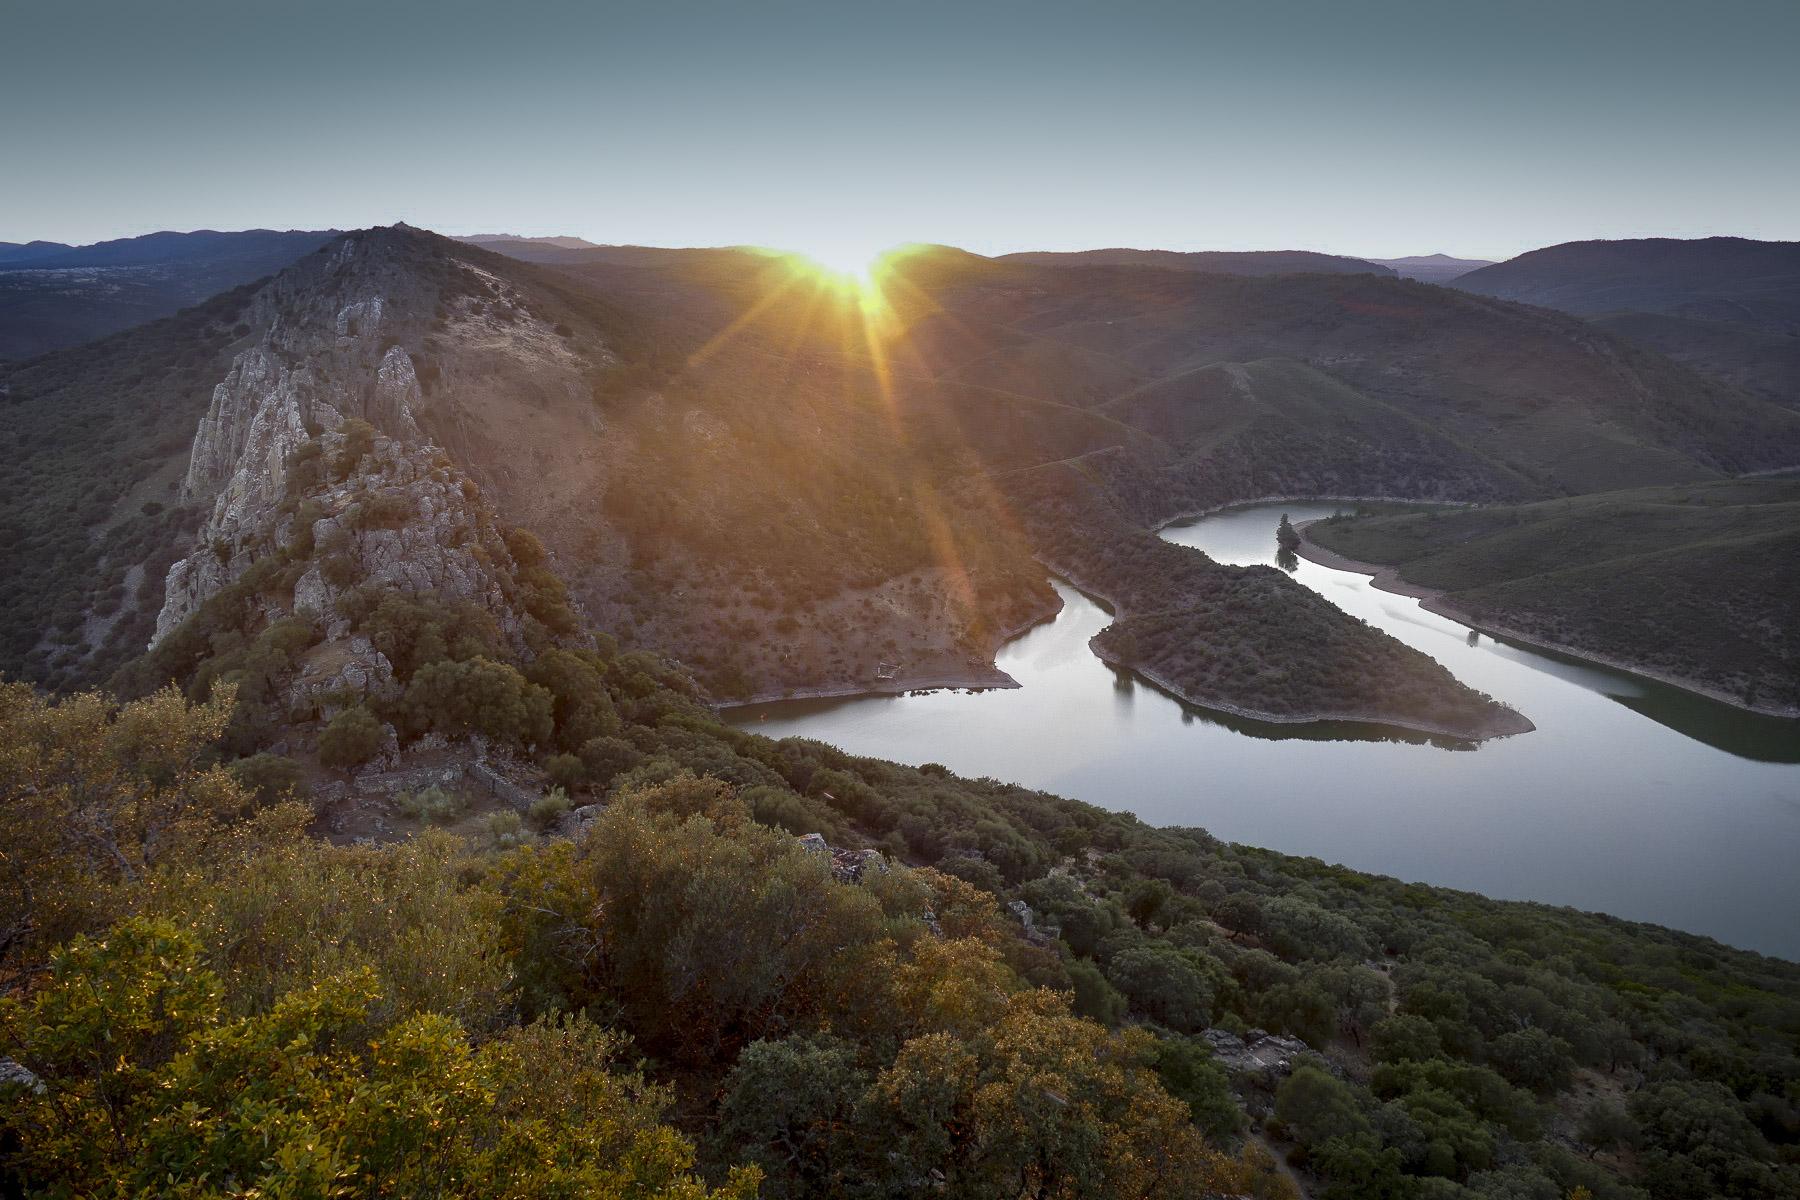 Noah's view of the sunset at Monfrague National Park. Noah Strycker